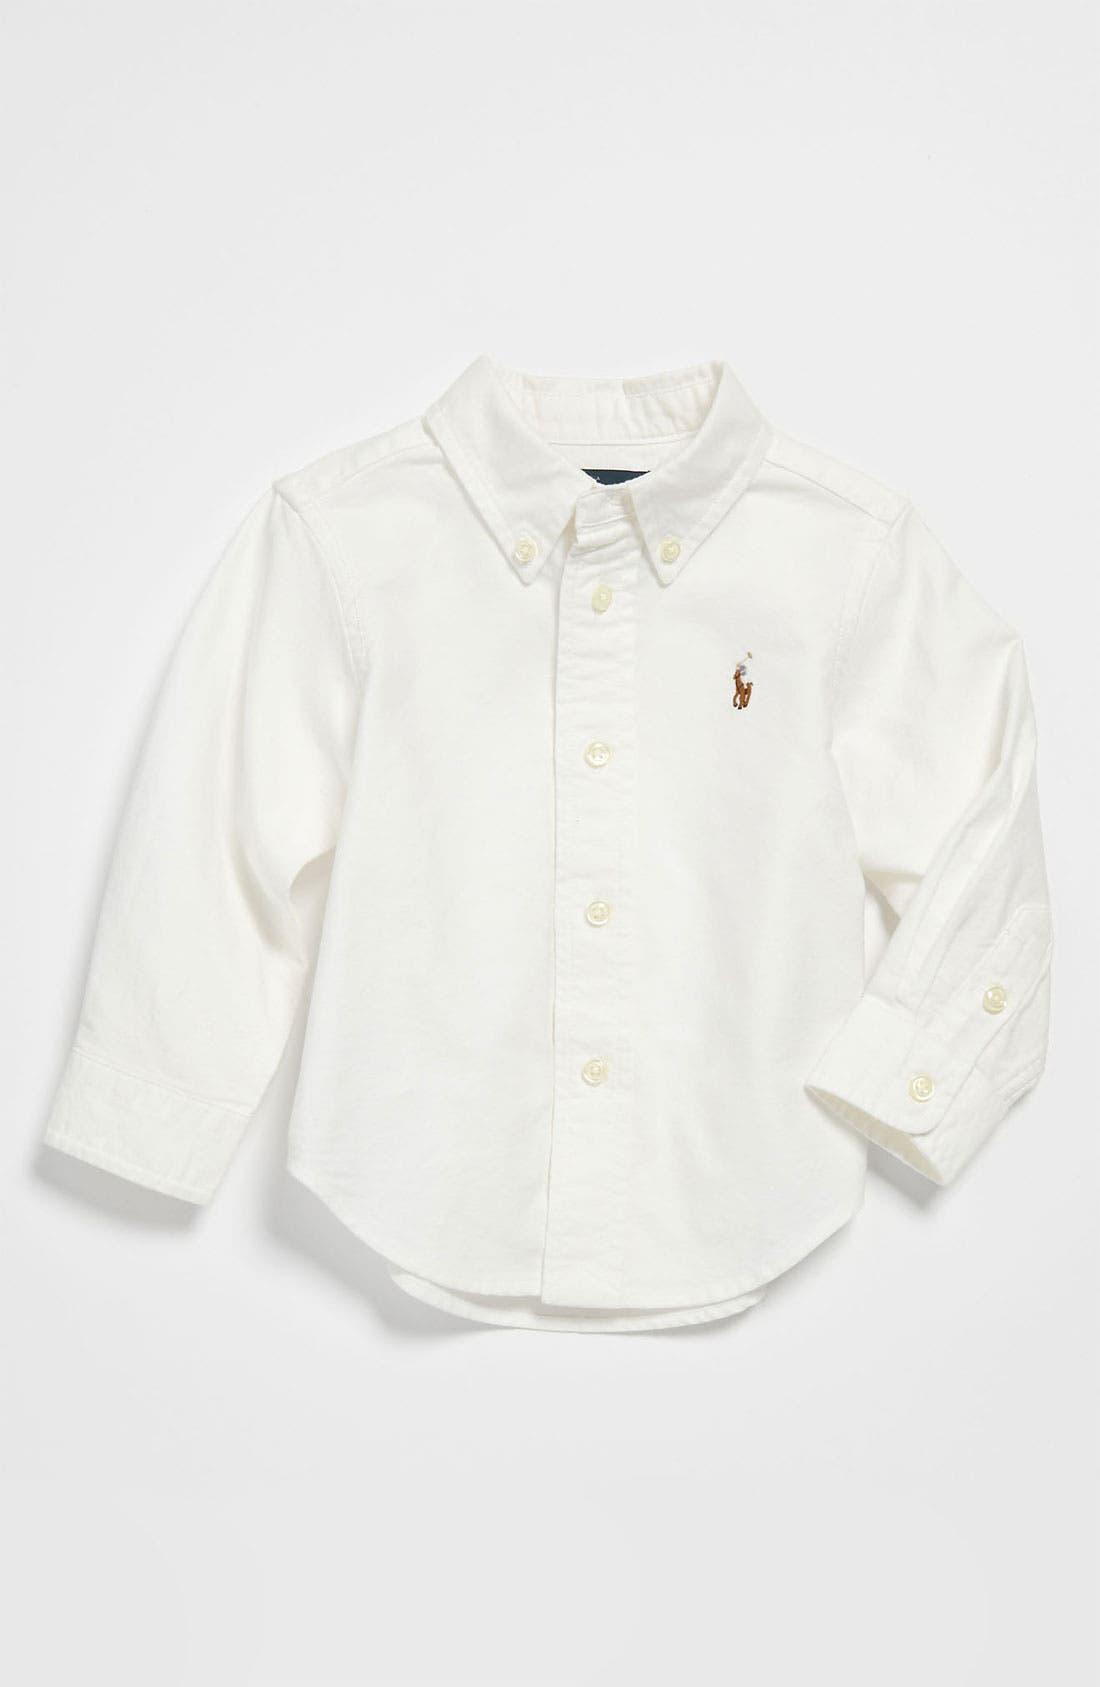 Main Image - Ralph Lauren Woven Shirt (Baby)